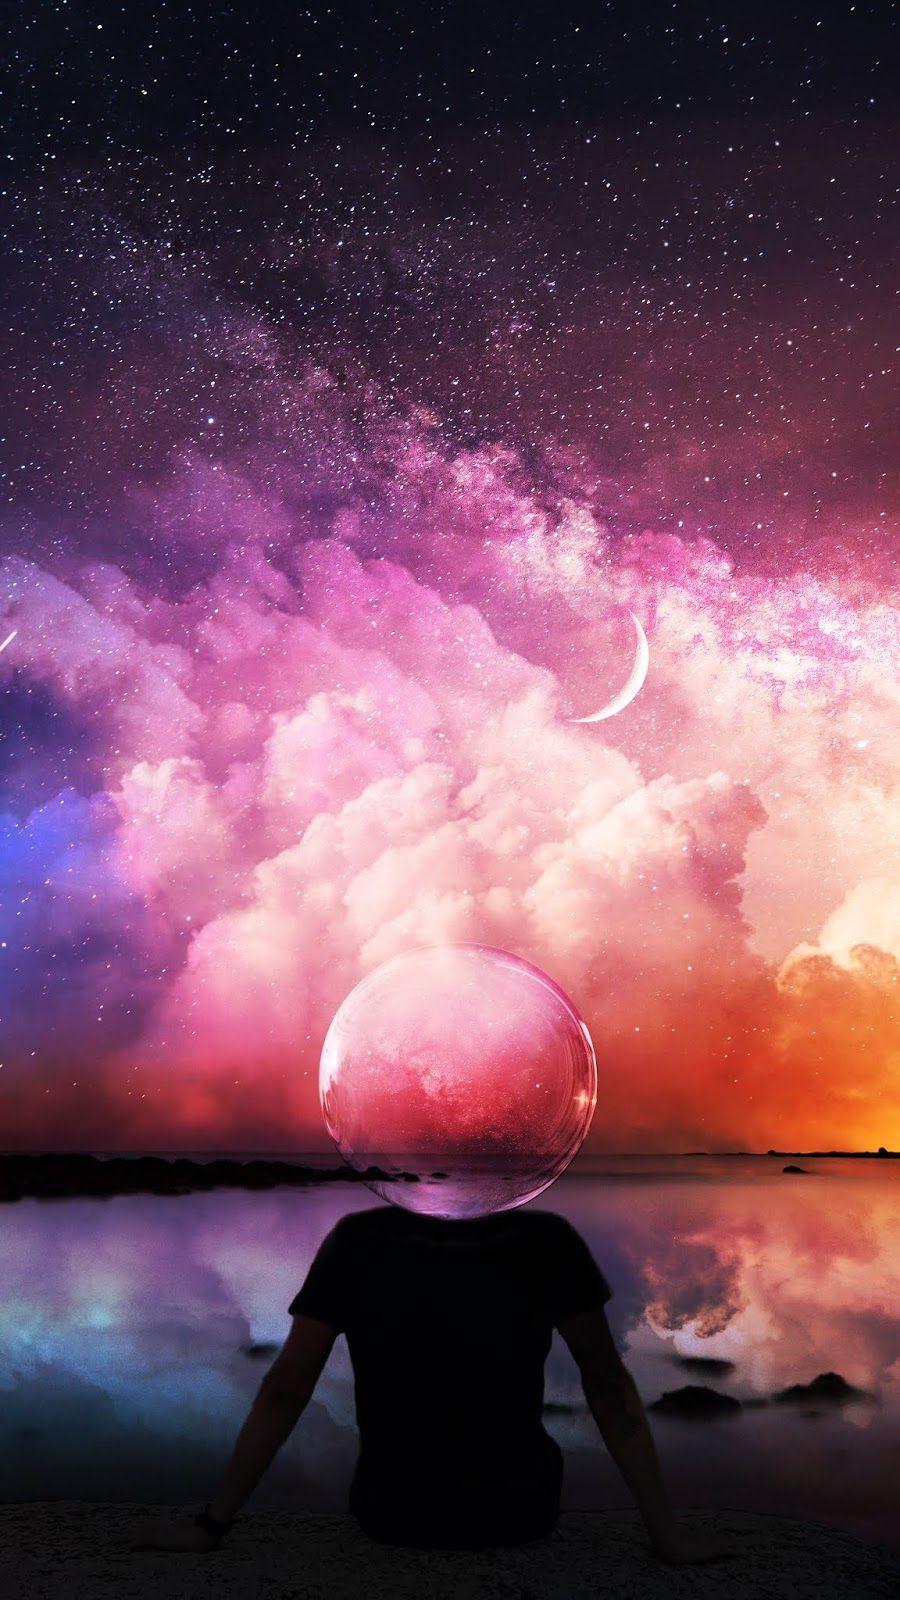 Beyond The Sky Night Sky Wallpaper Sky Aesthetic Art Wallpaper